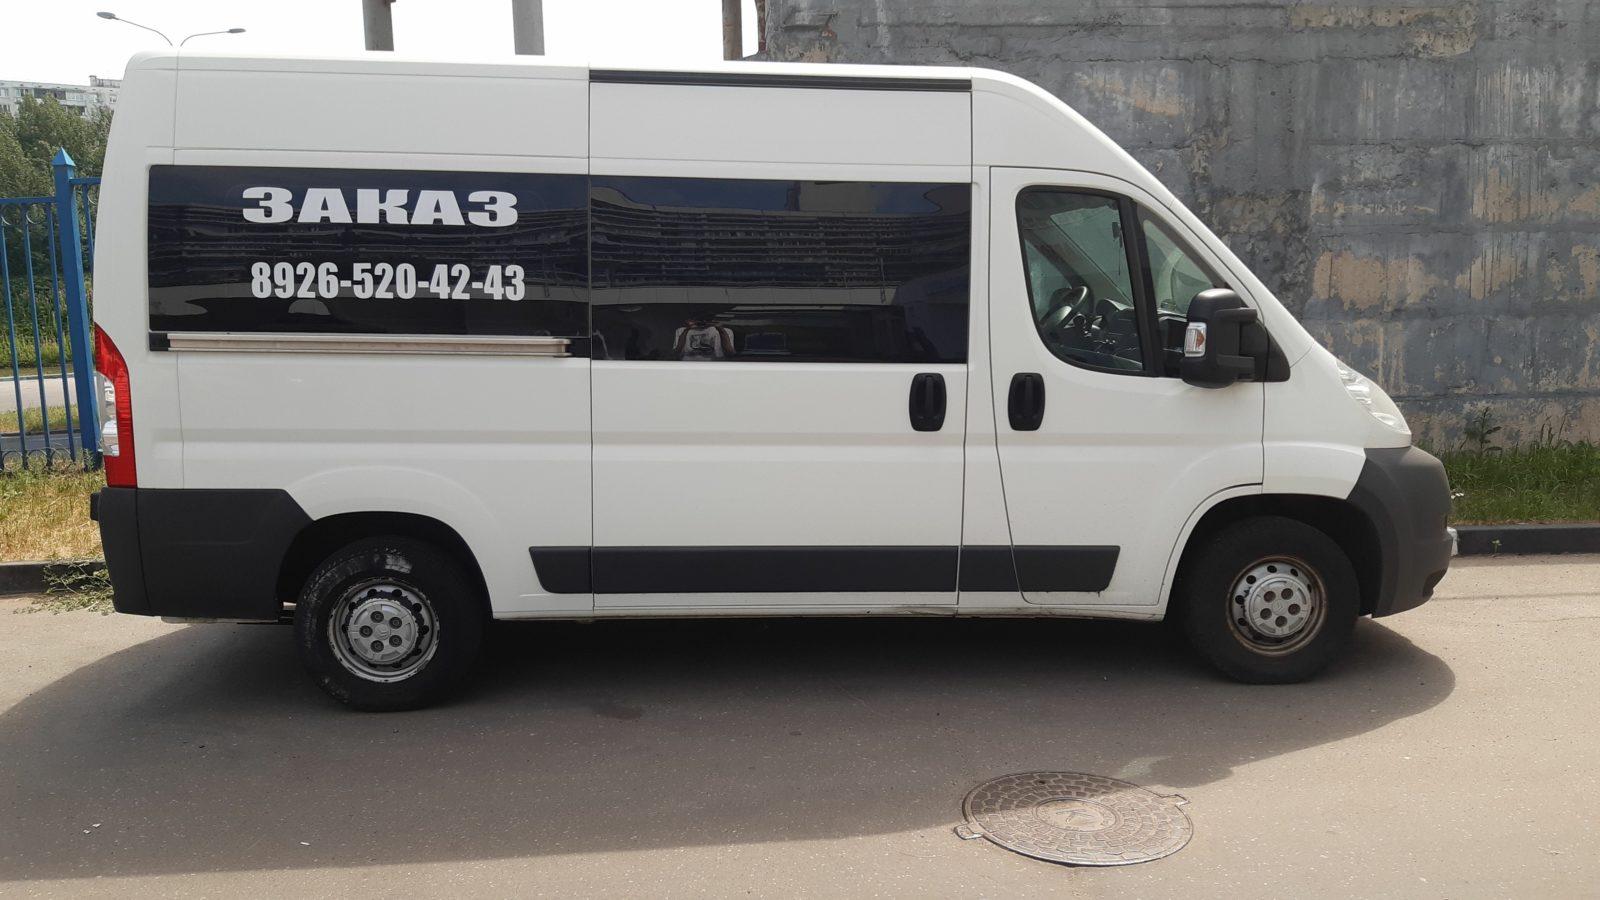 Автомобиля аренда с водителем в Москве - услуги микроавтобуса | Тонна-СВ